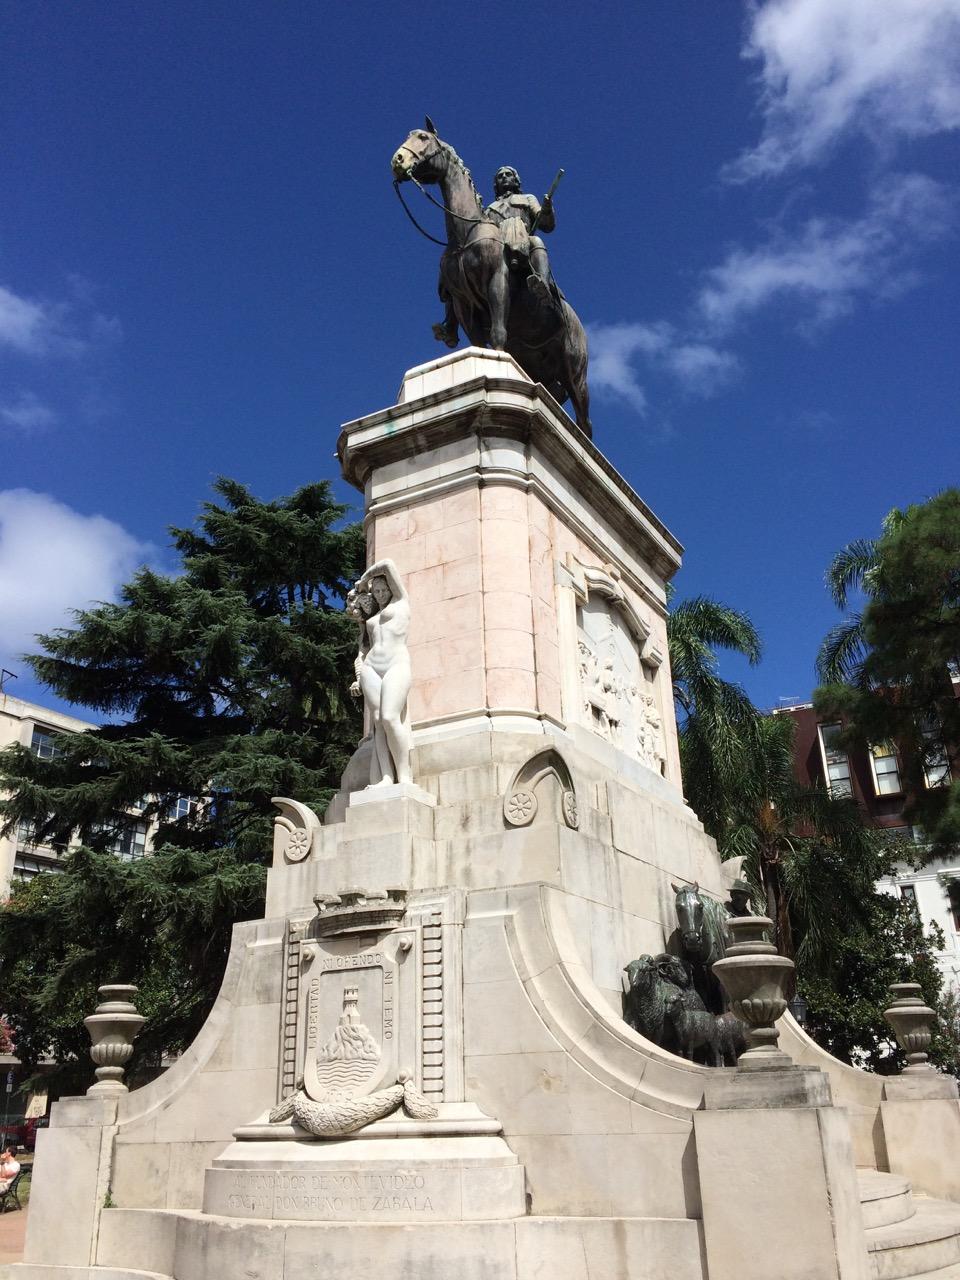 Bruno Mauricio de Zabala, the founder of Montevideo